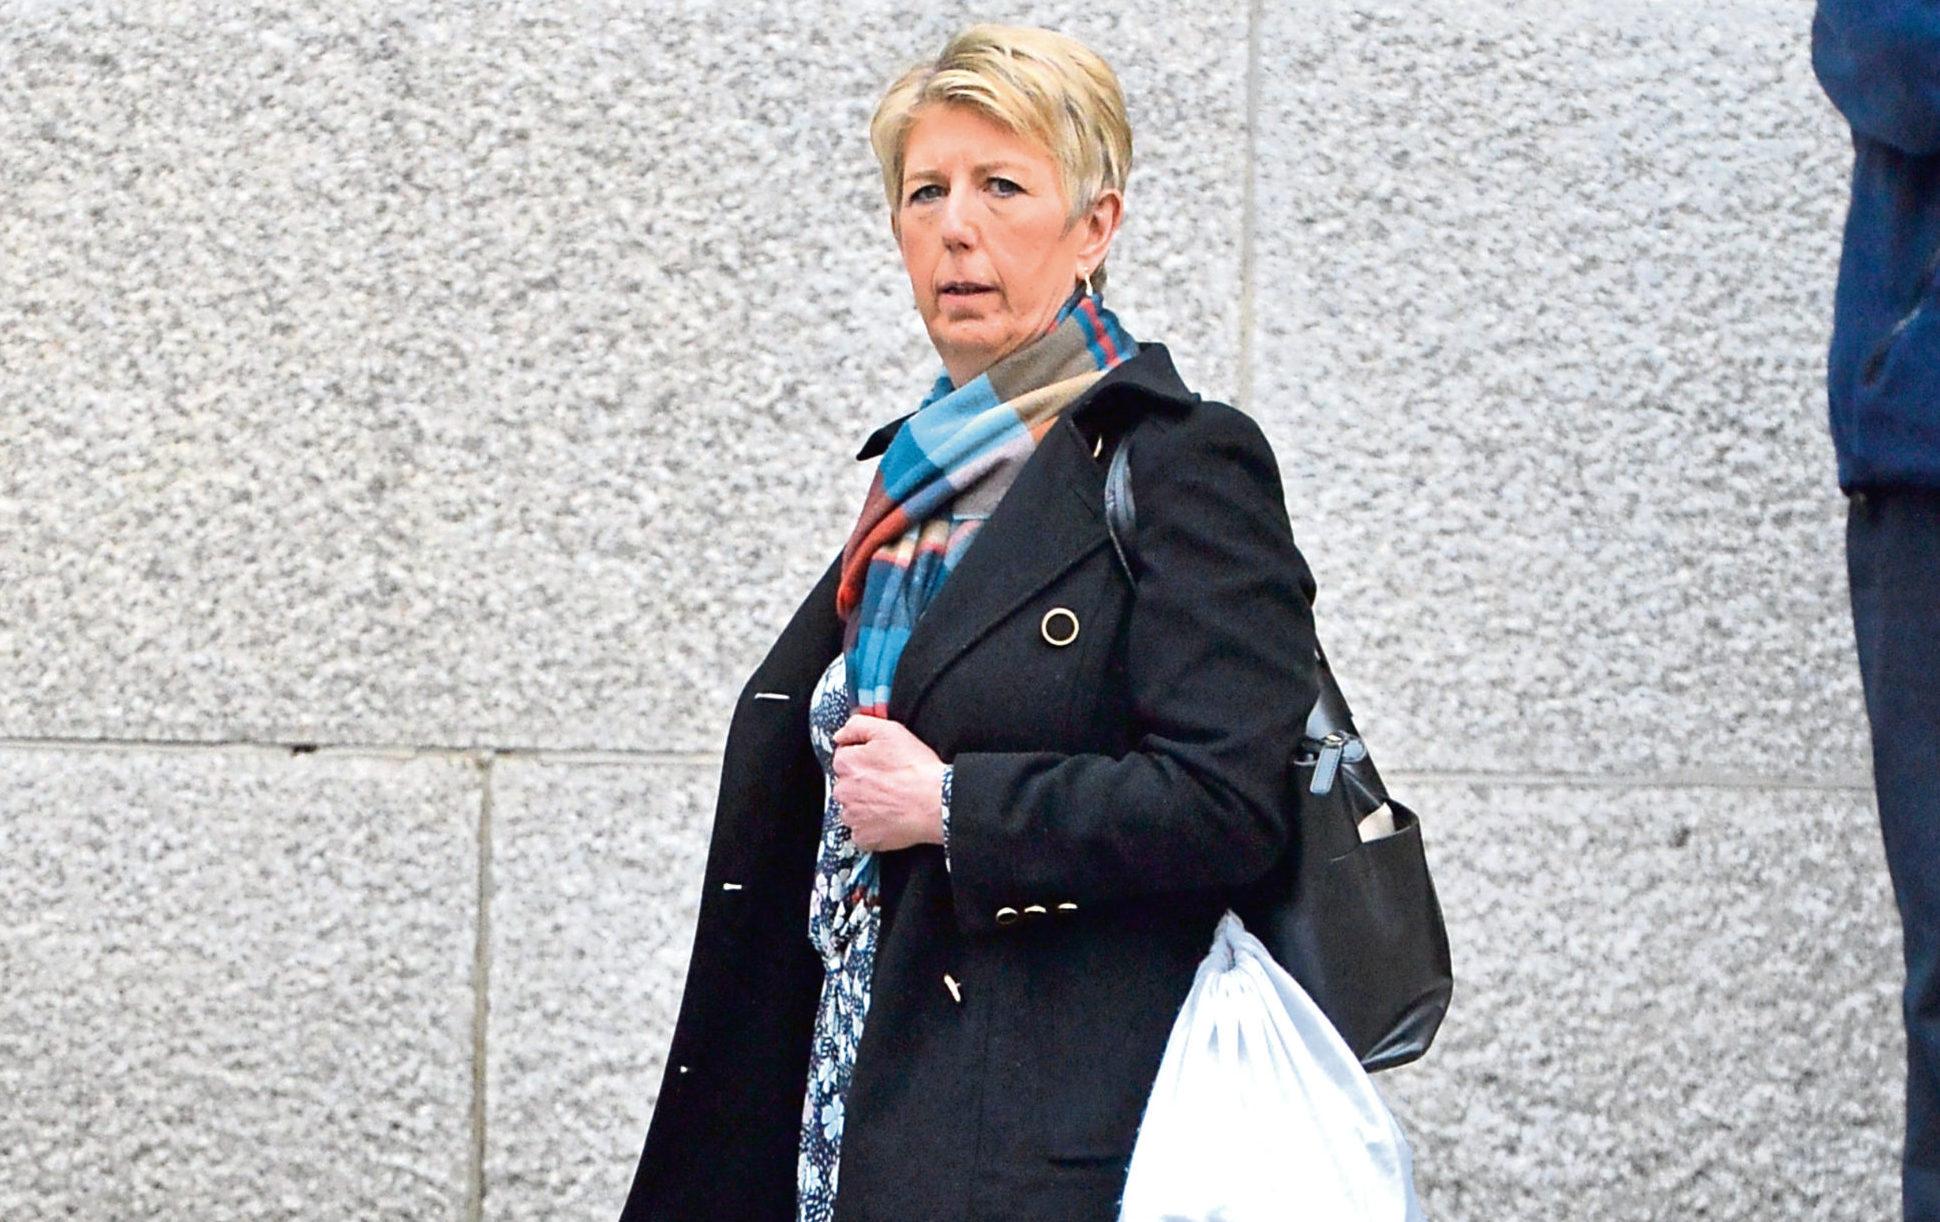 Former Labour MP Angela Smith